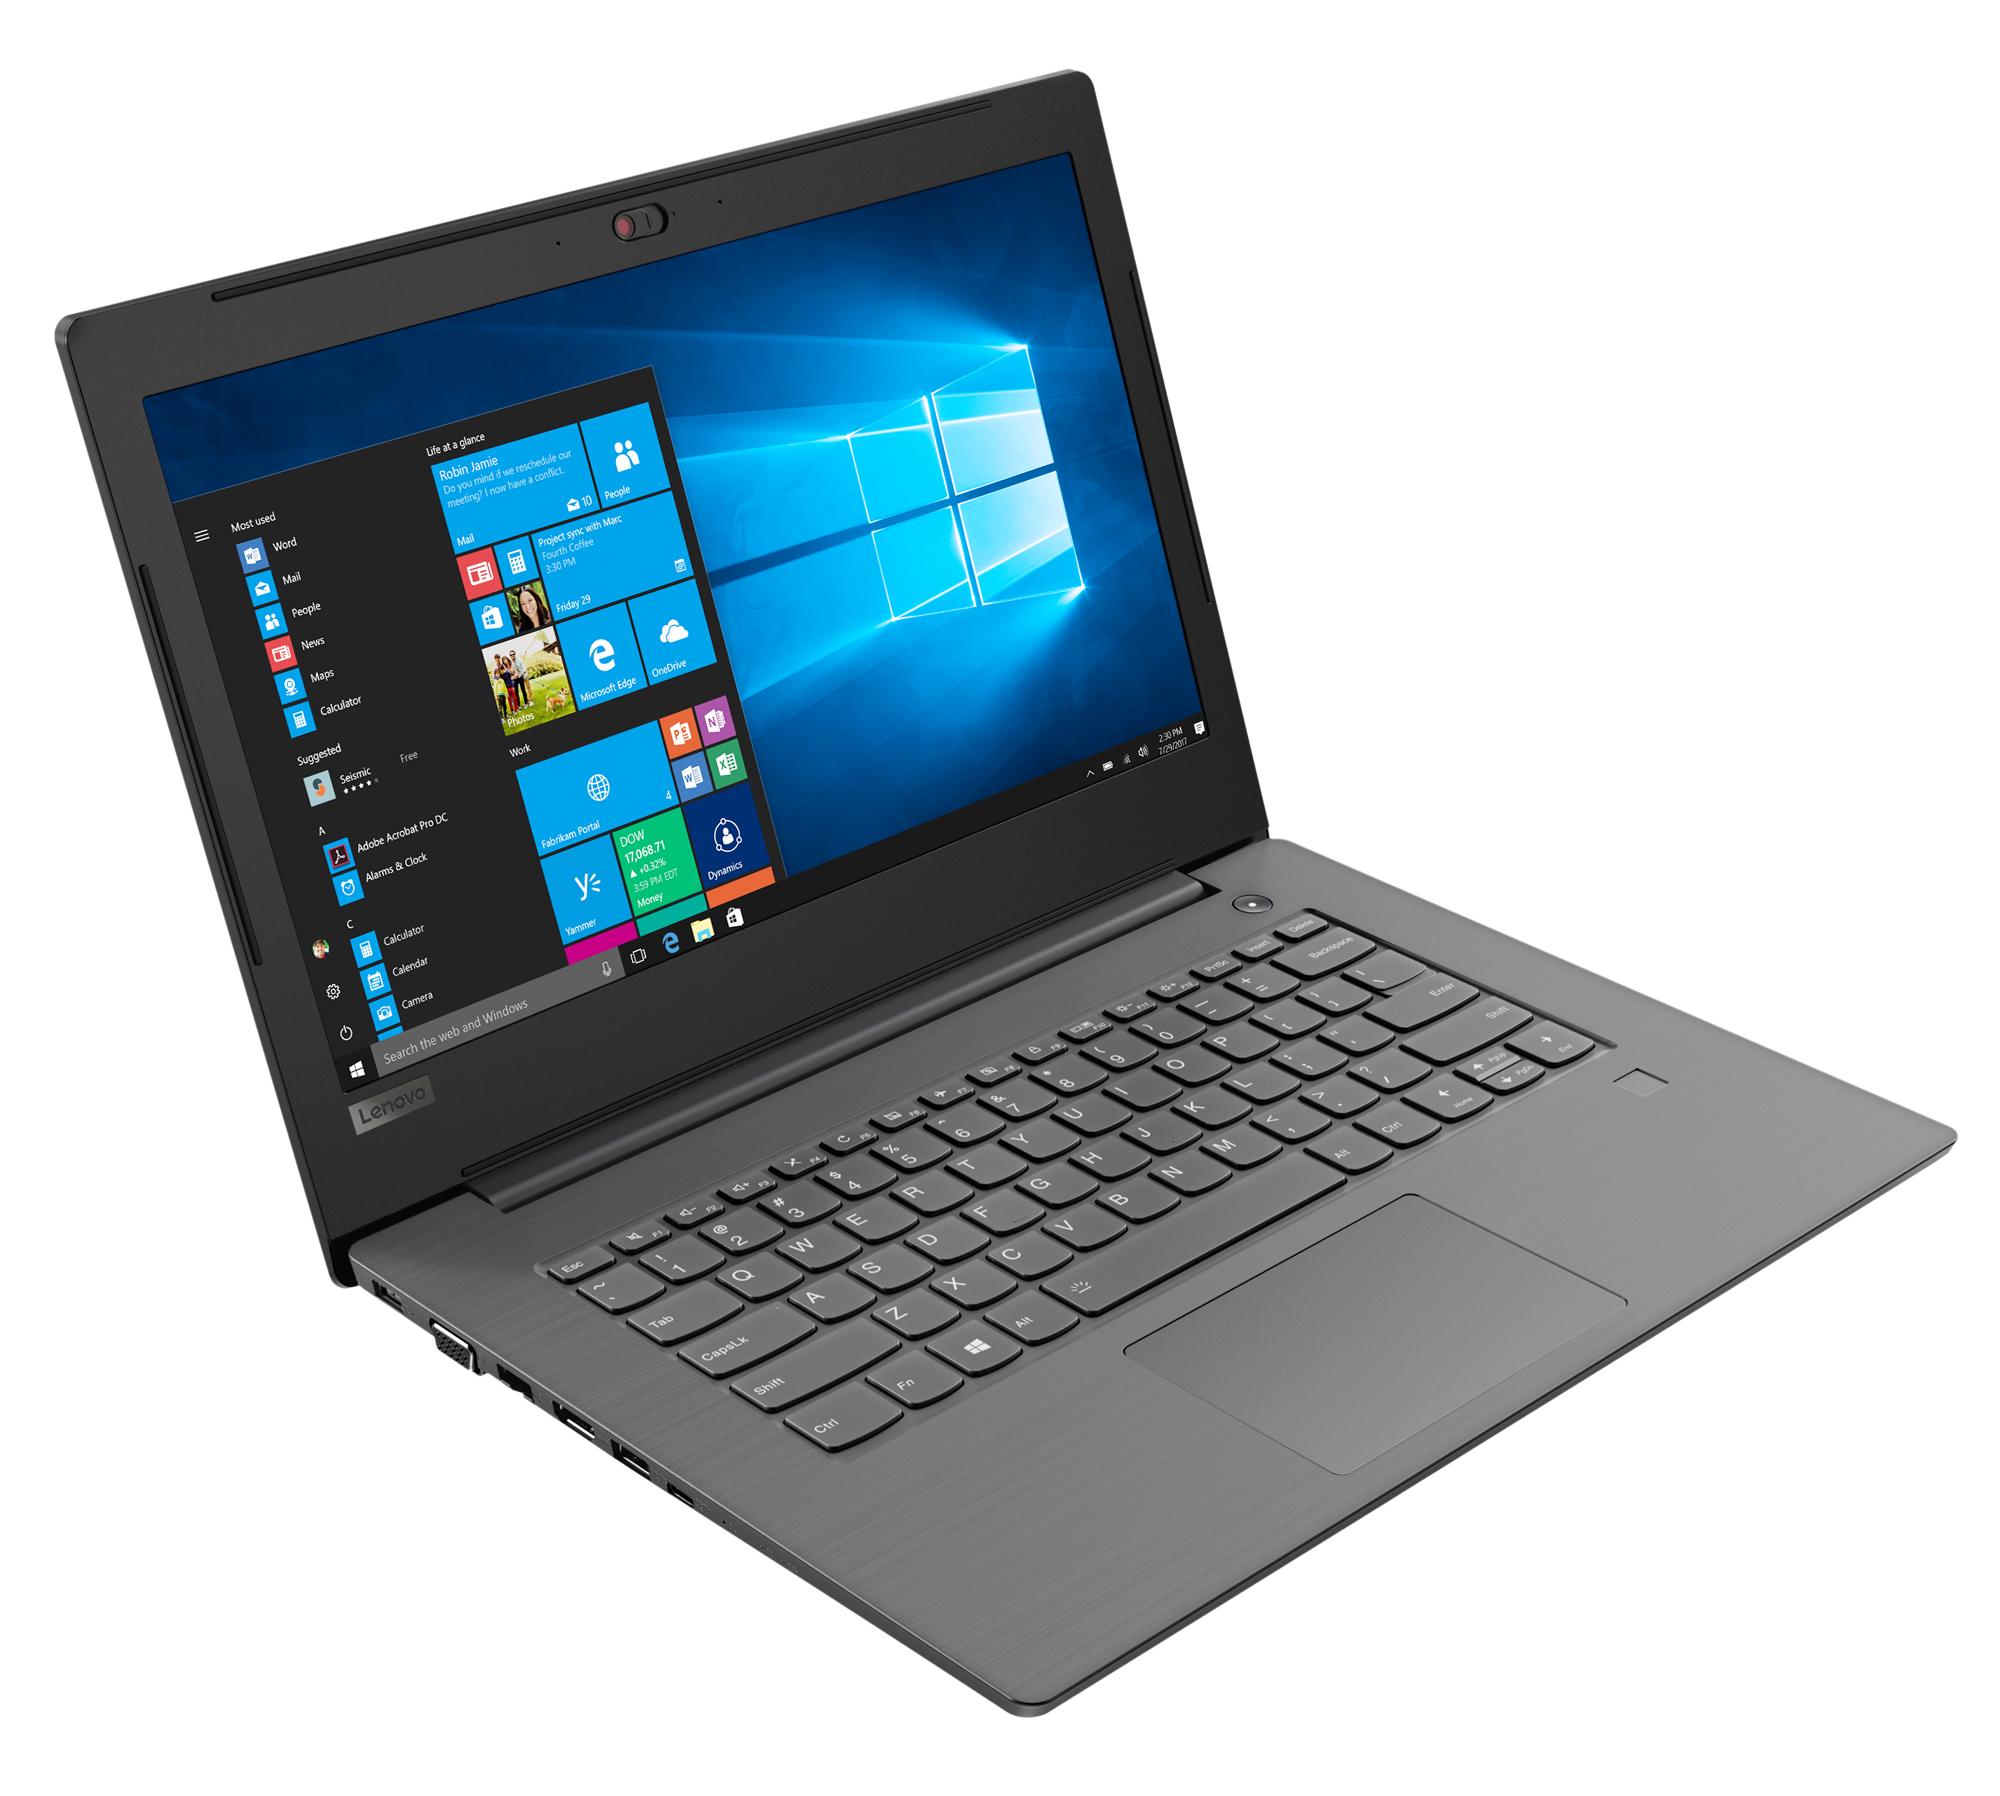 Фото  Ноутбук Lenovo V330-14IKB Iron Grey (81B000HKUA)